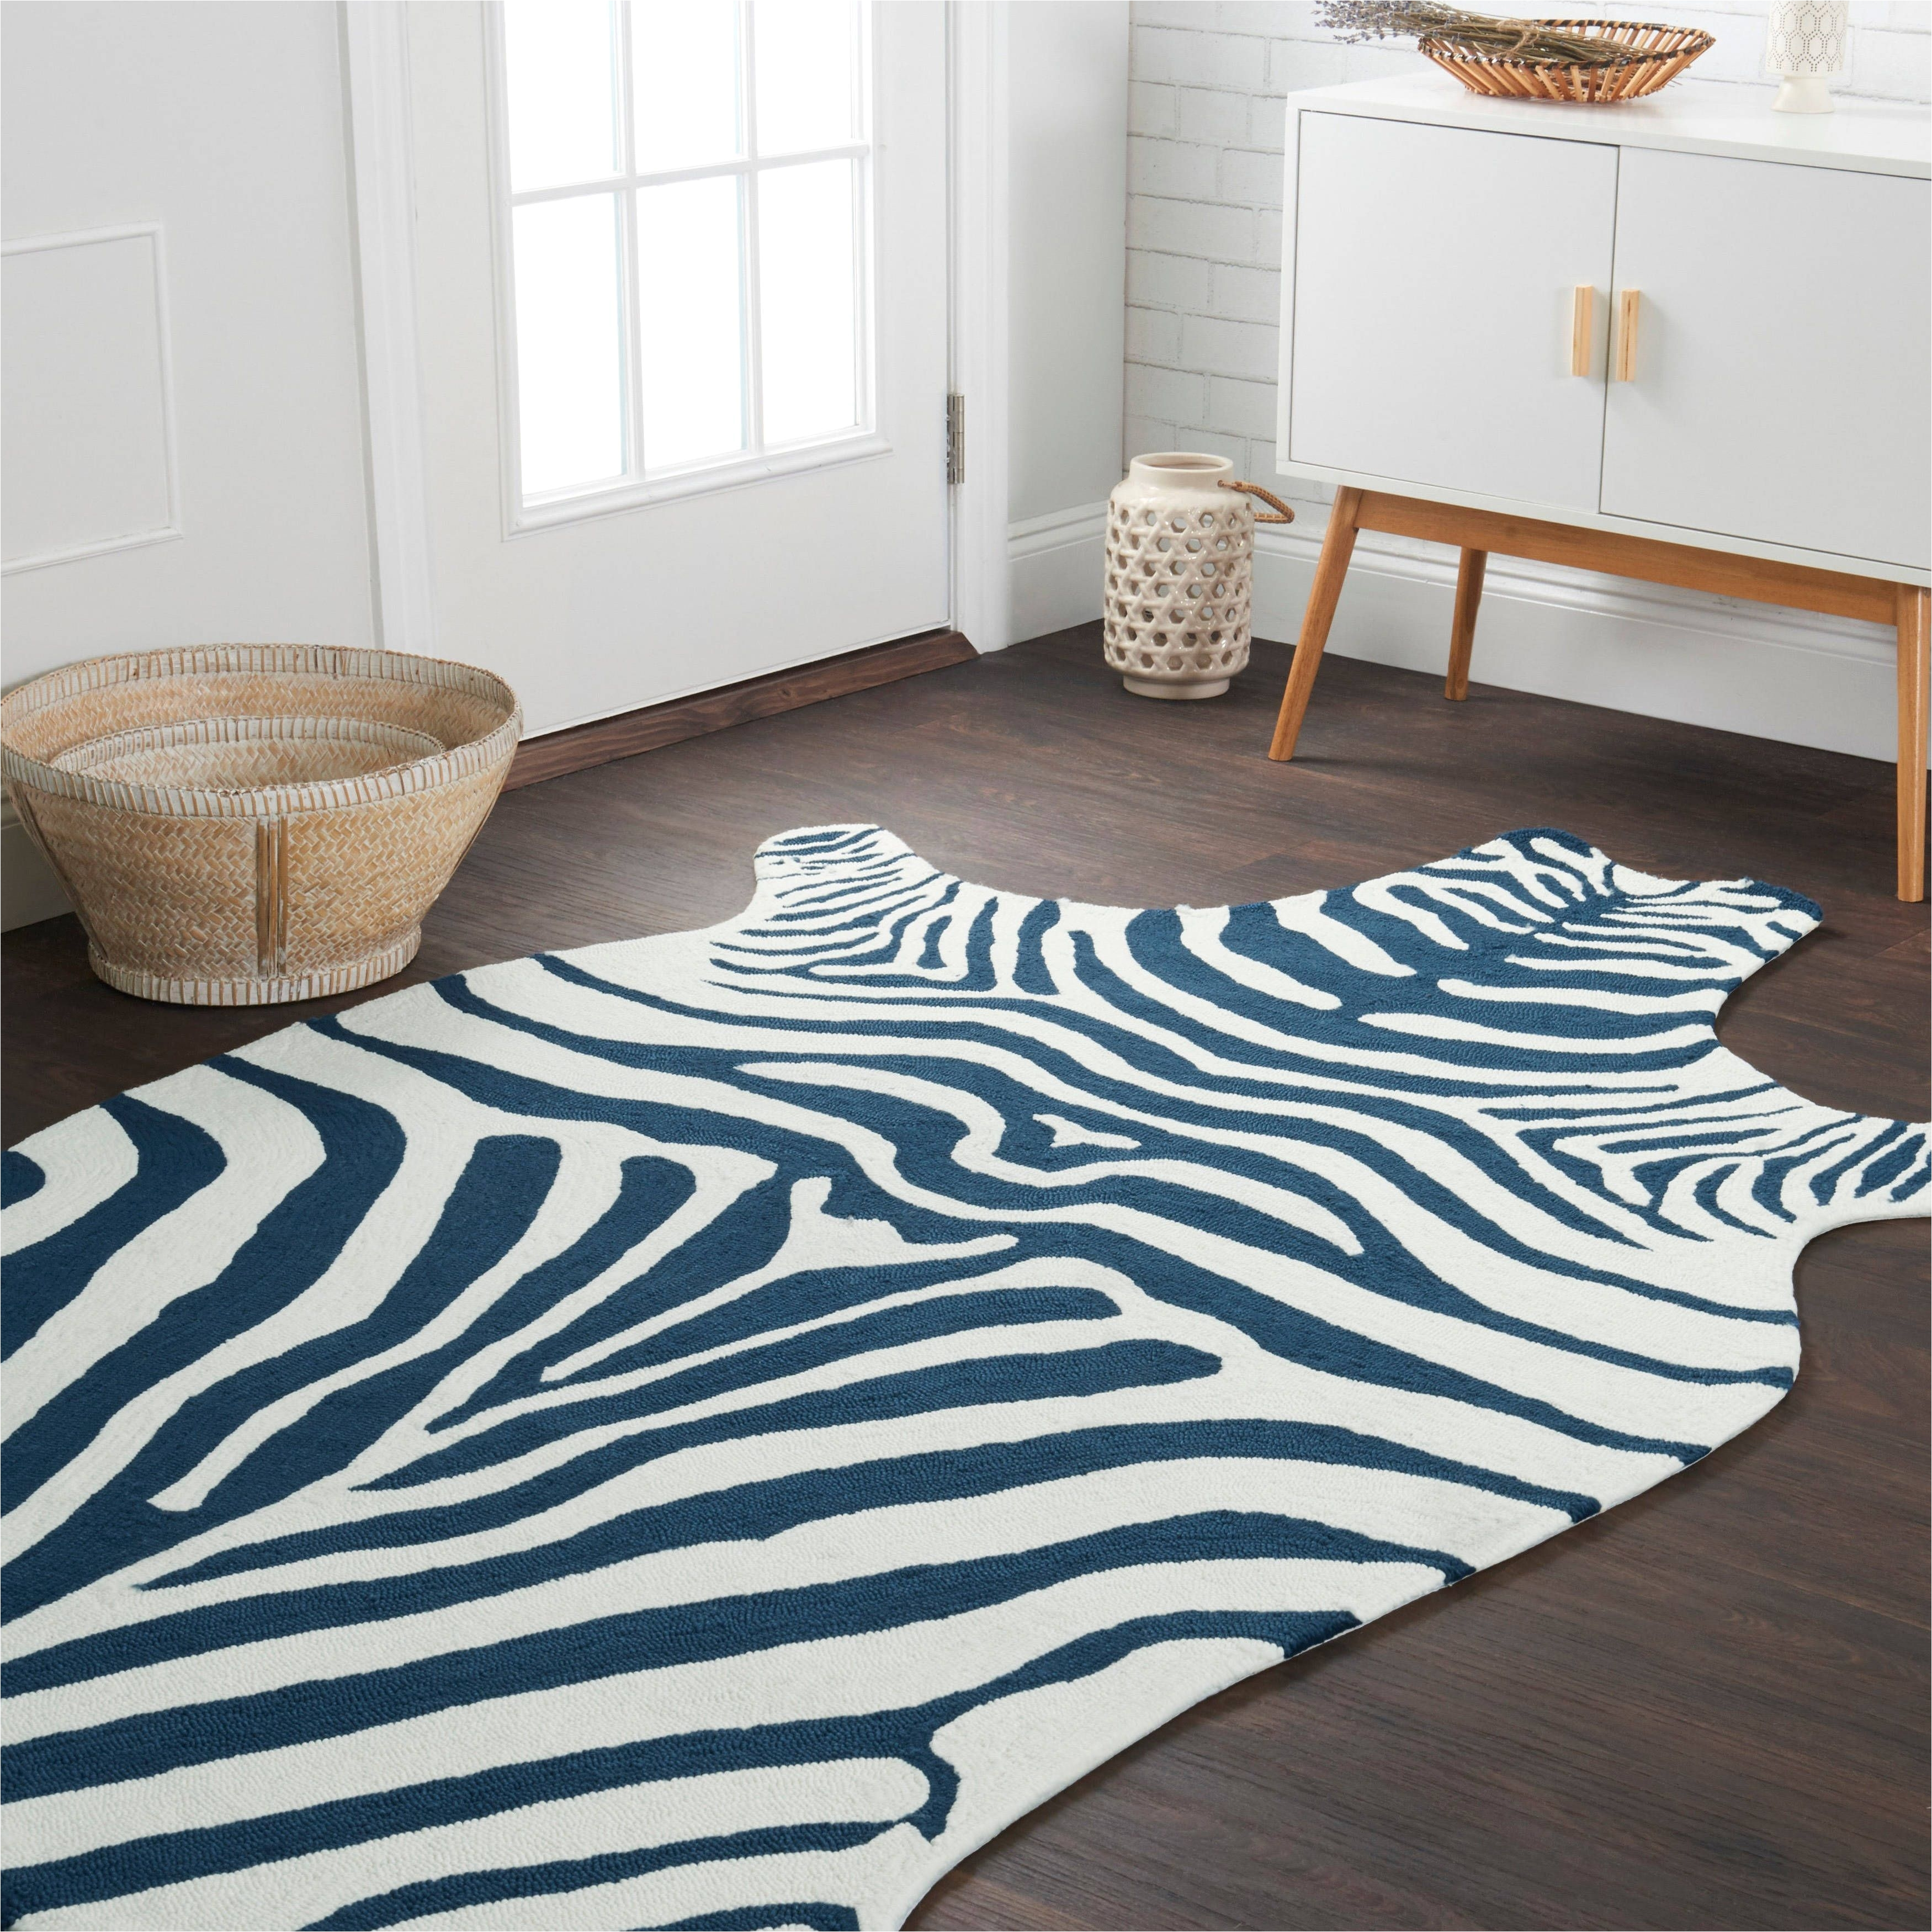 alexander home indoor outdoor hand hooked savannah zebra rug 3 6 x 5 6 blue white 3 6 x 5 6 size 4 x 6 polypropylene animal